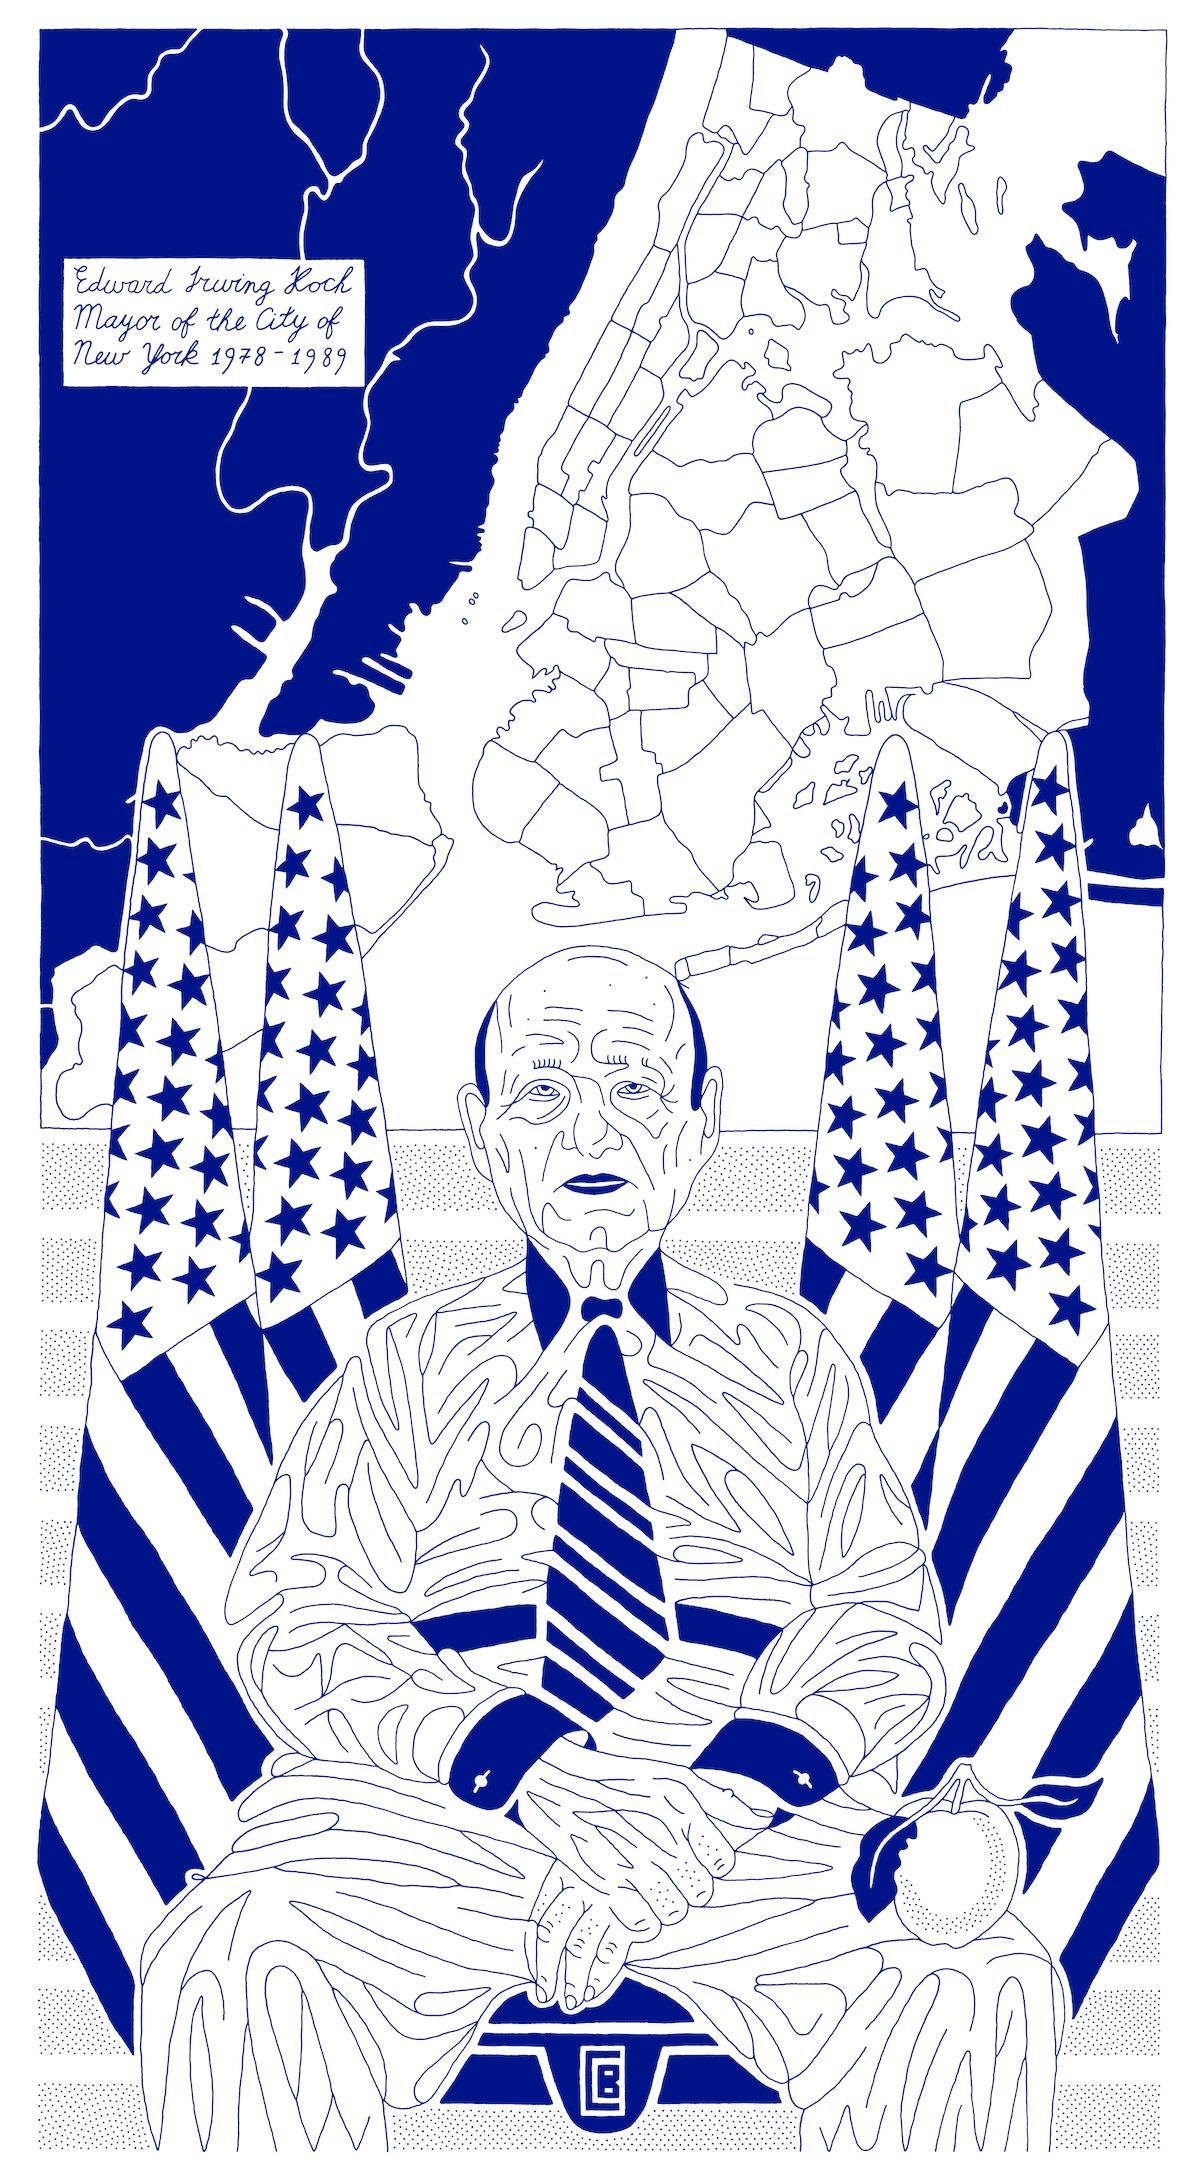 Koch - Mayor of the City of New York